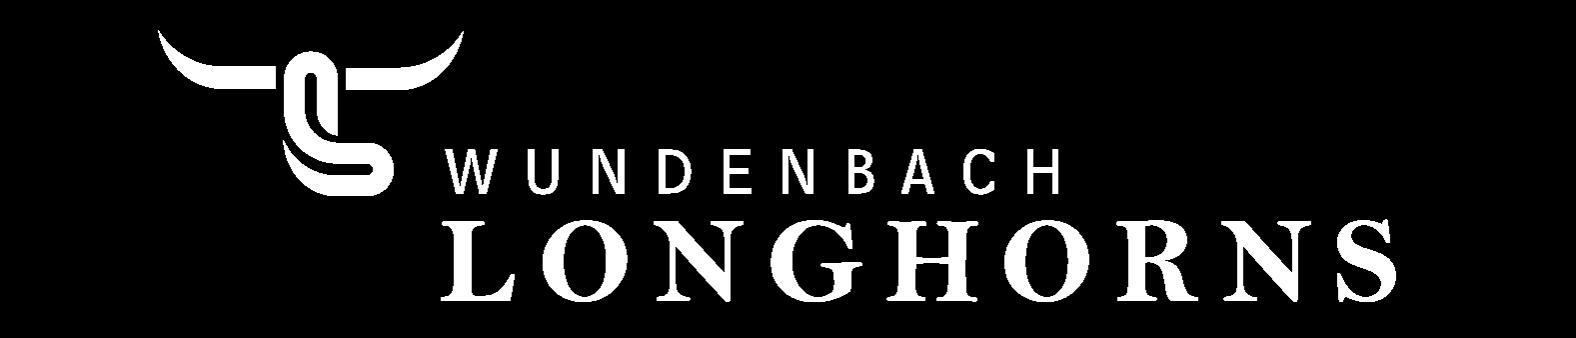 Wundenbach Longhorns